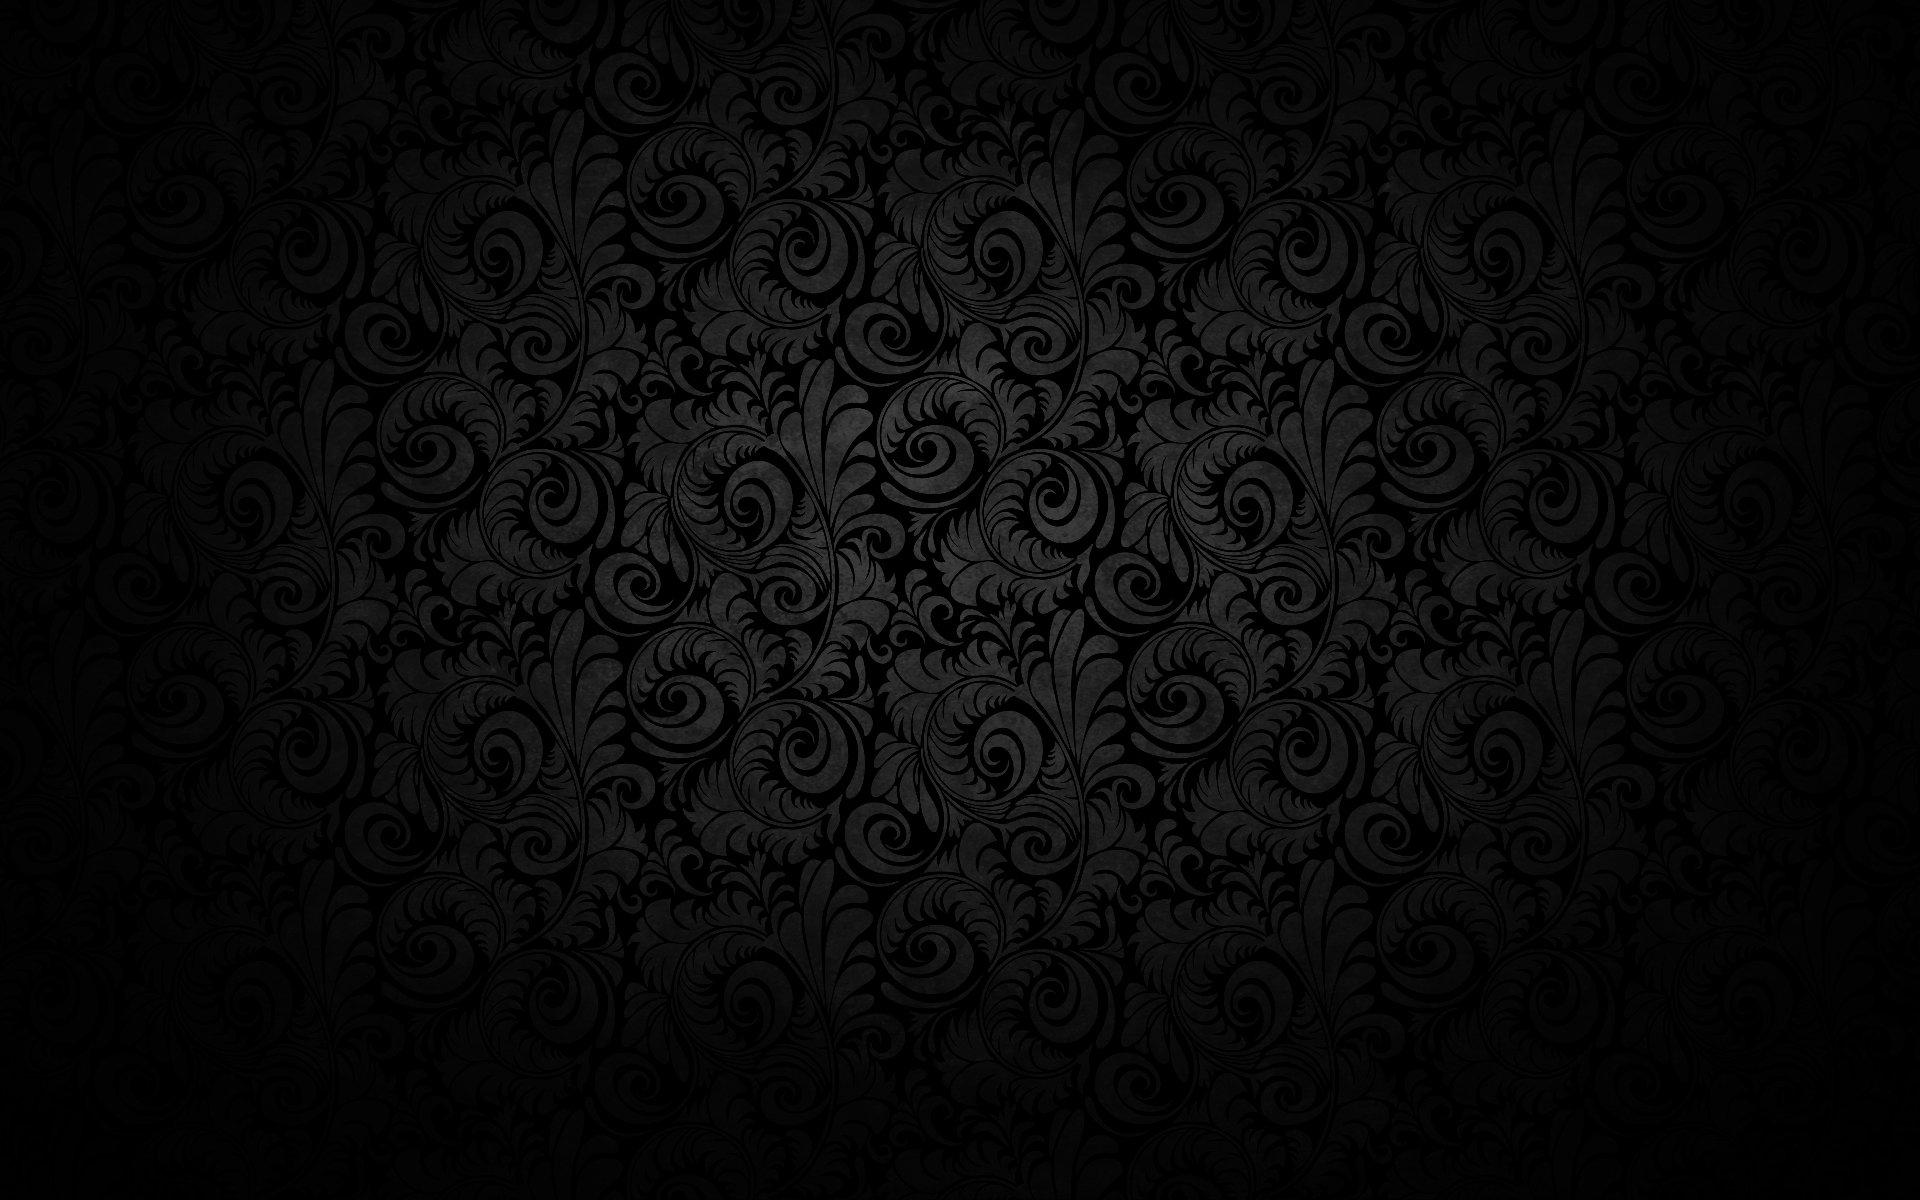 black_background_pattern_light_texture_55291_1920x1200.jpg